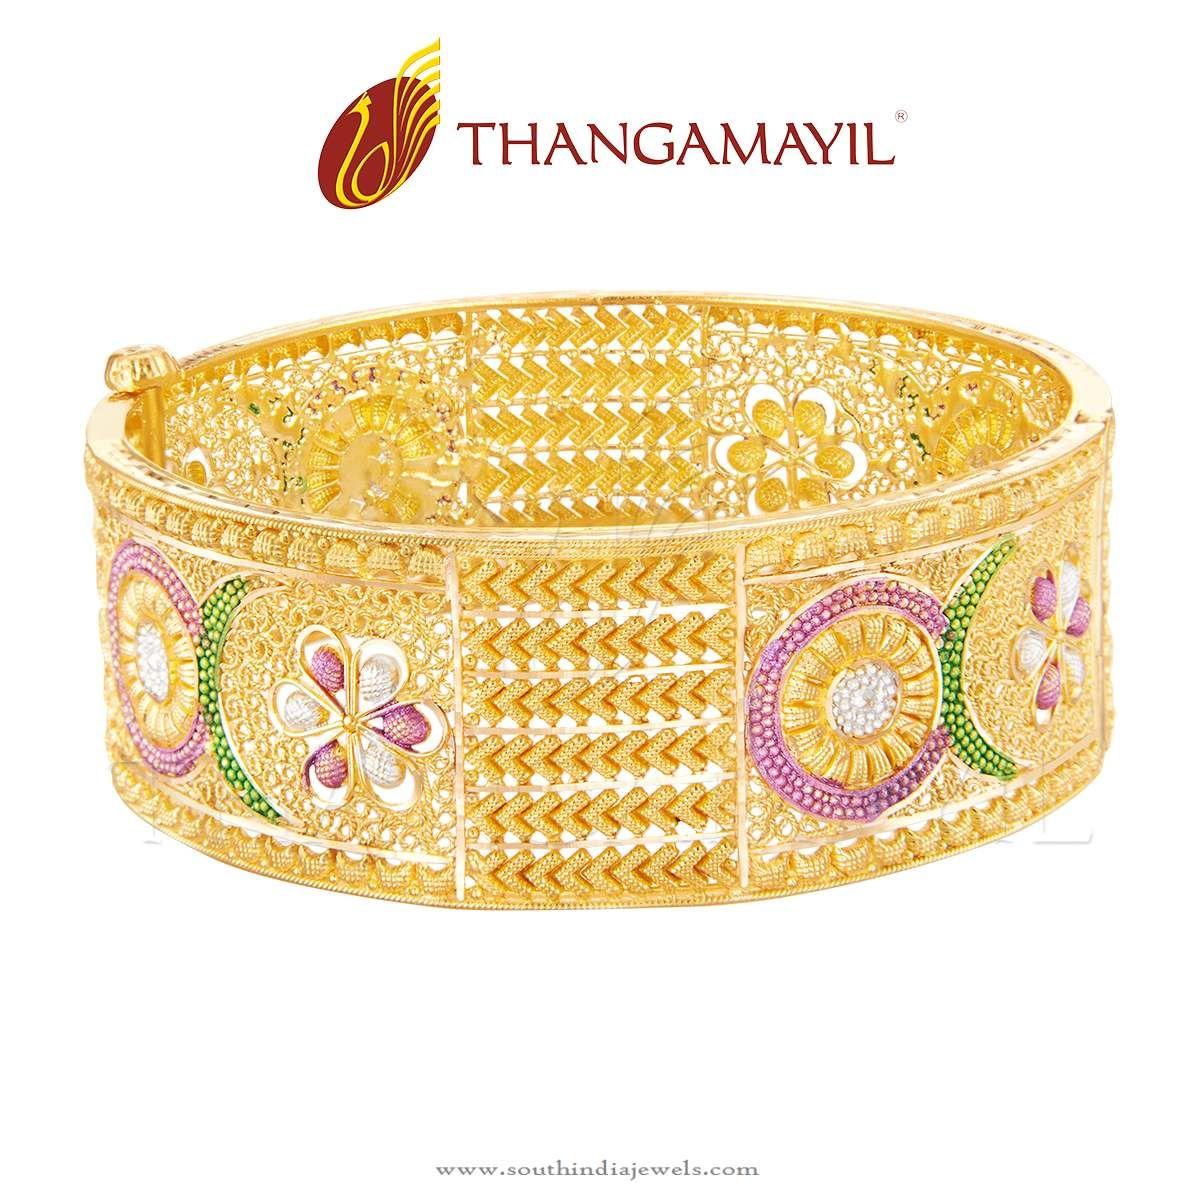 Big Bridal Gold Bangle From Thangamayil Jewellery | Gold bangles ...